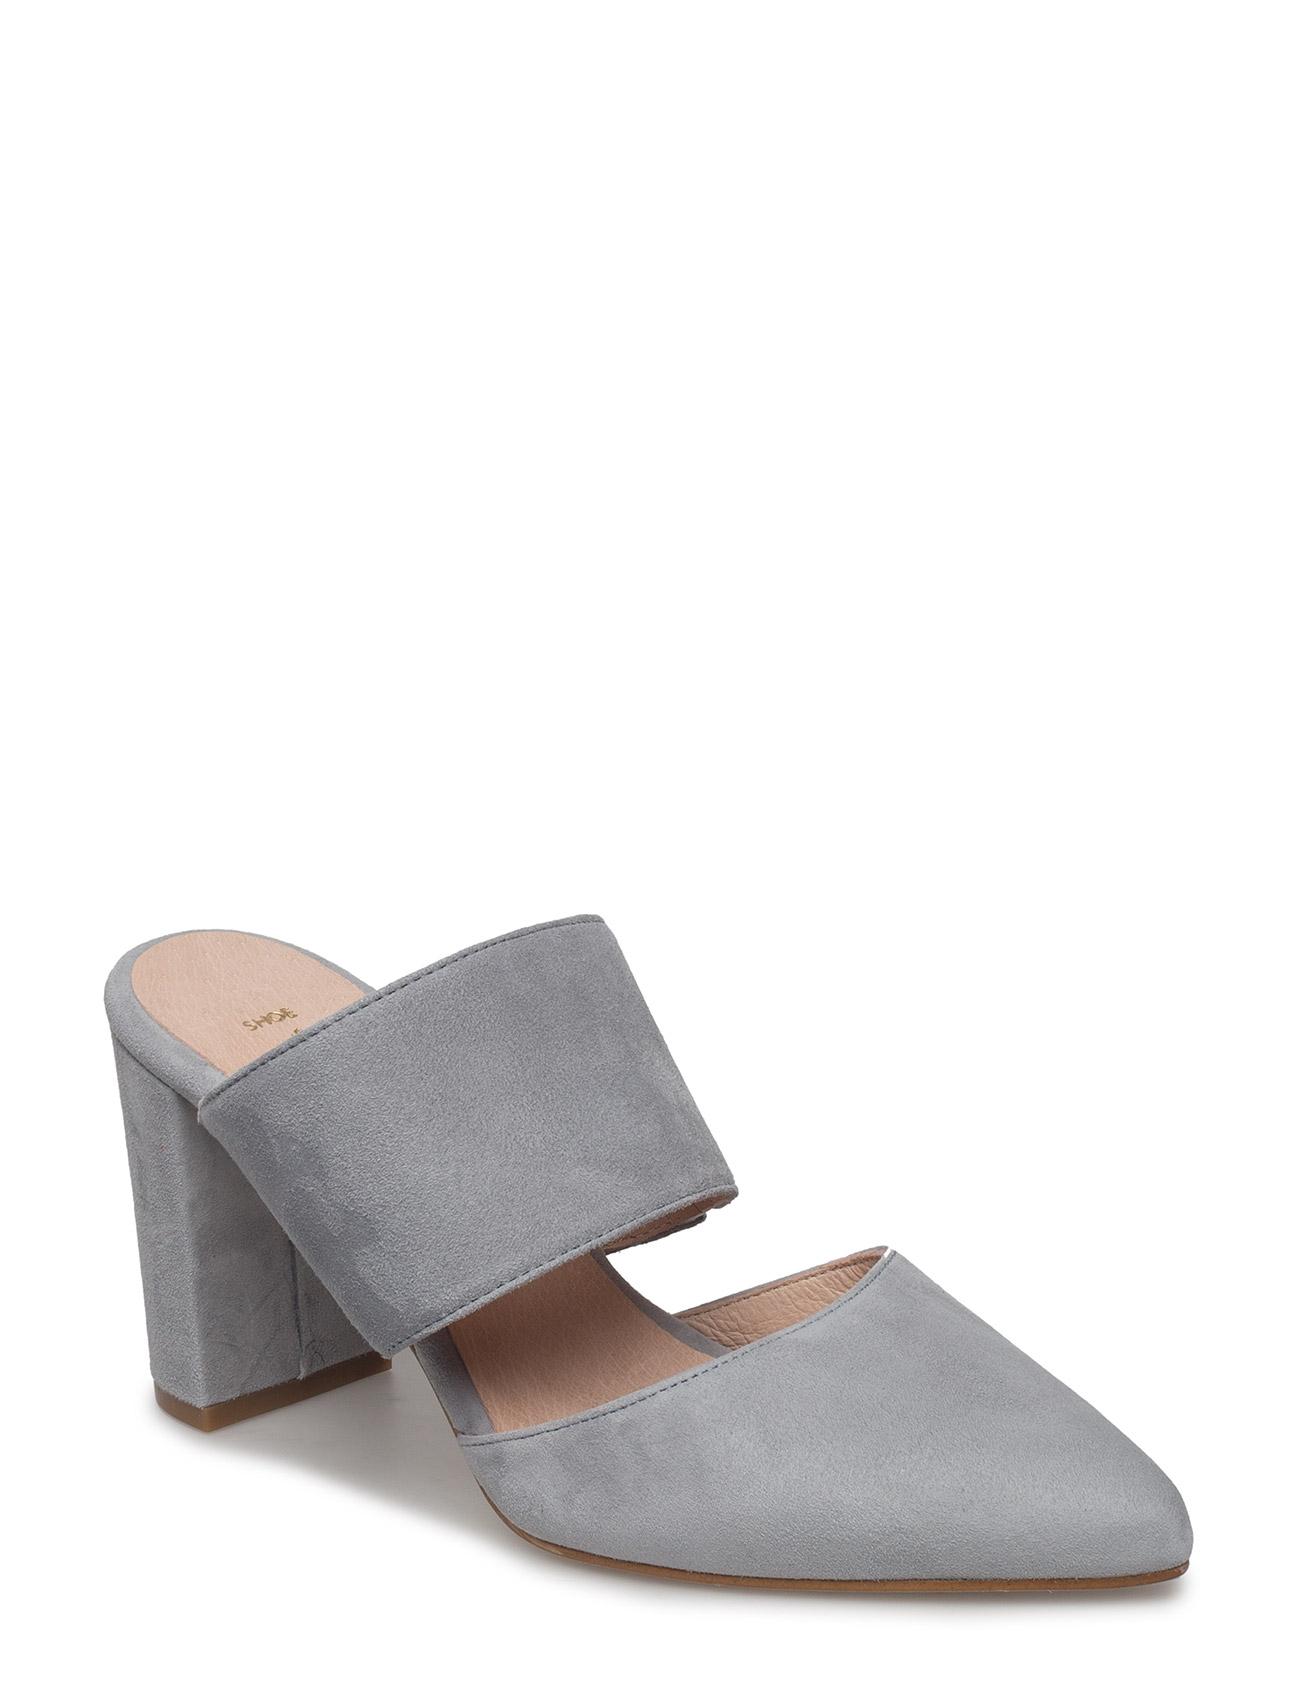 Shoe The Bear SELMA S